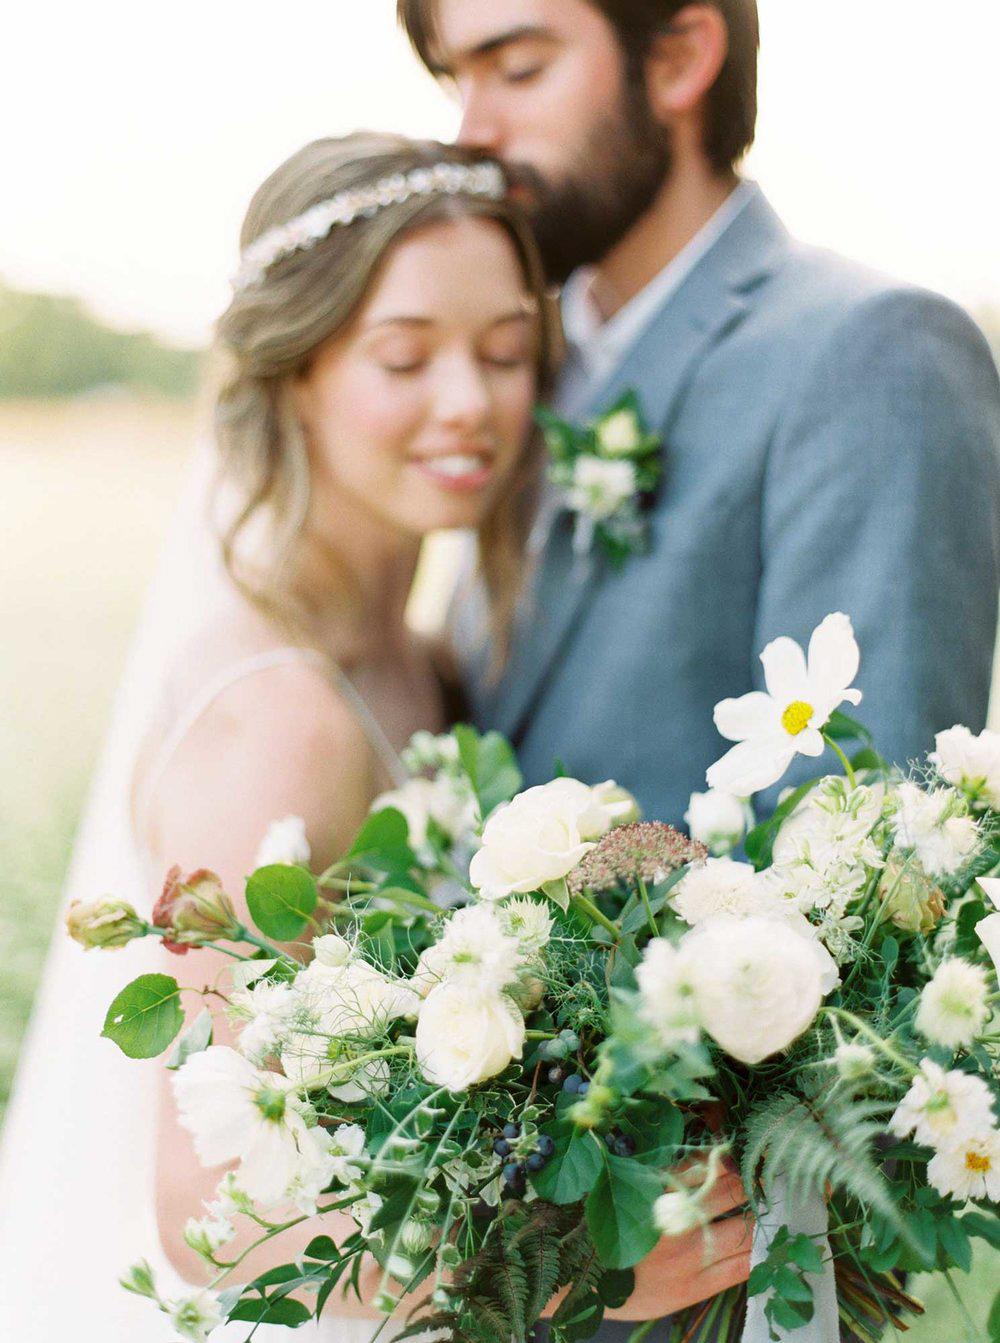 kayla-yestal-vineyard-bride-swish-list-woodland-weddings-niagara-wedding-editorial-1.jpg